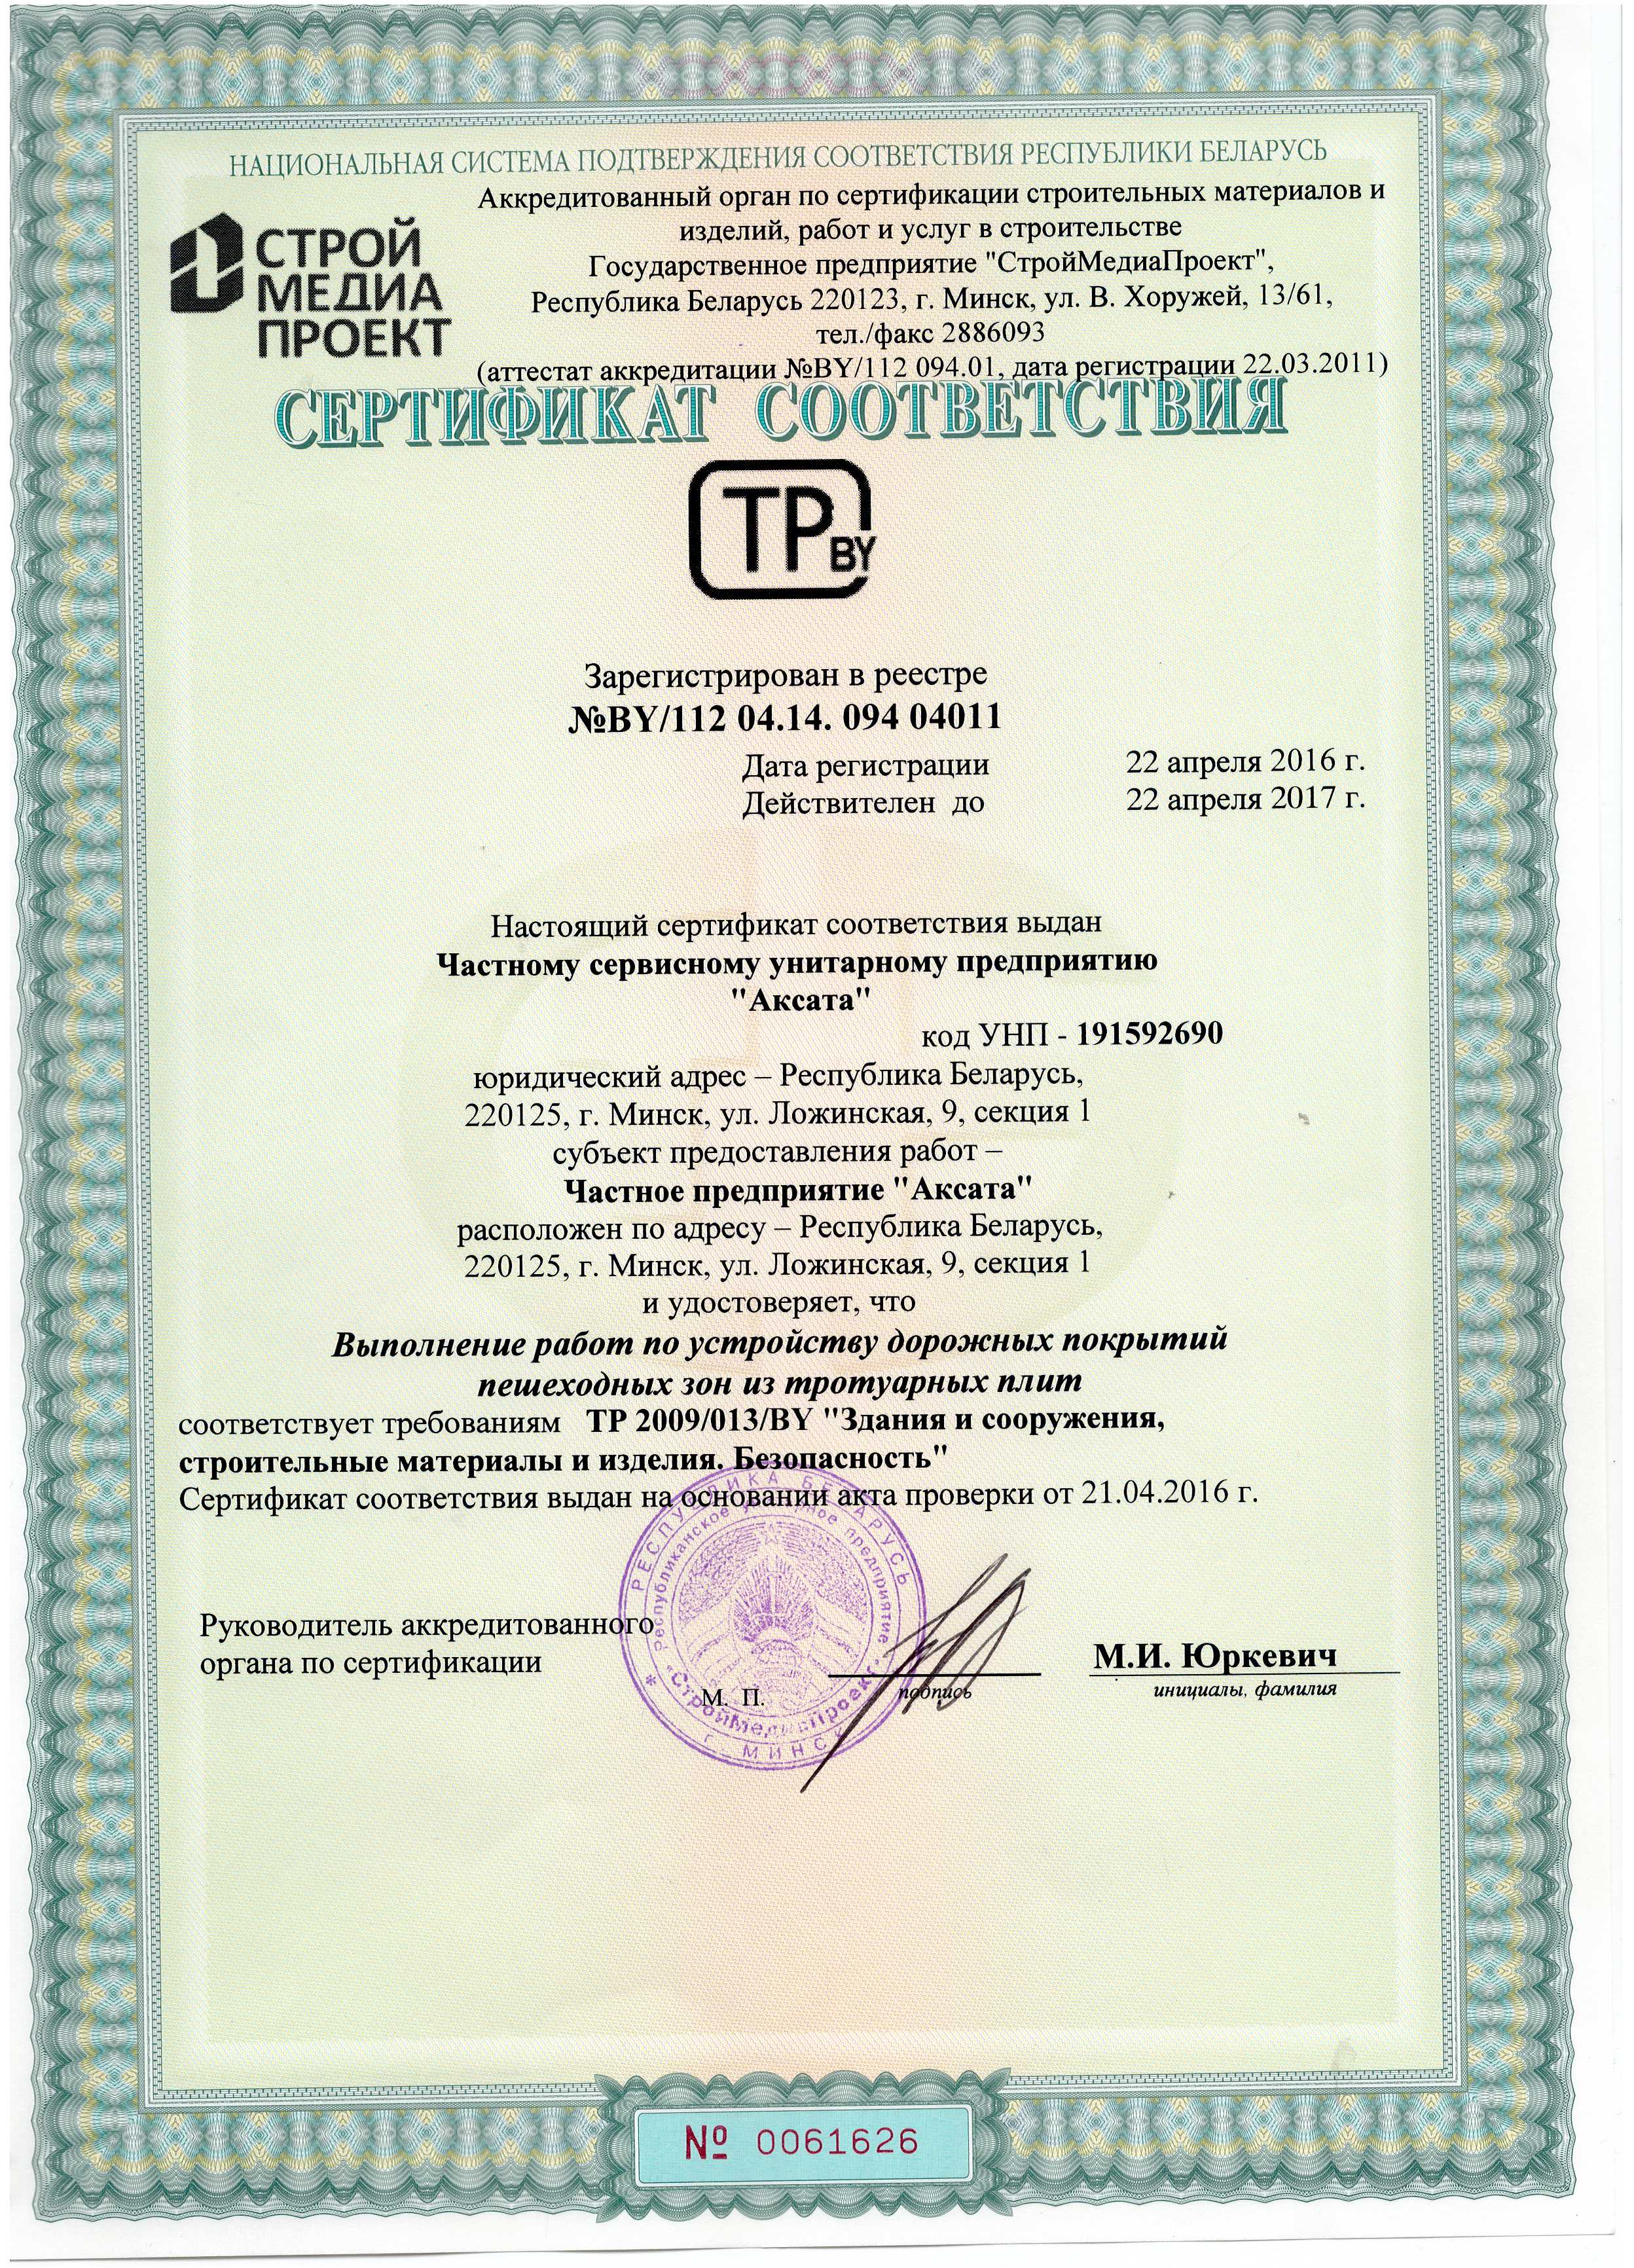 Сертификат соответствия, компания Аксата